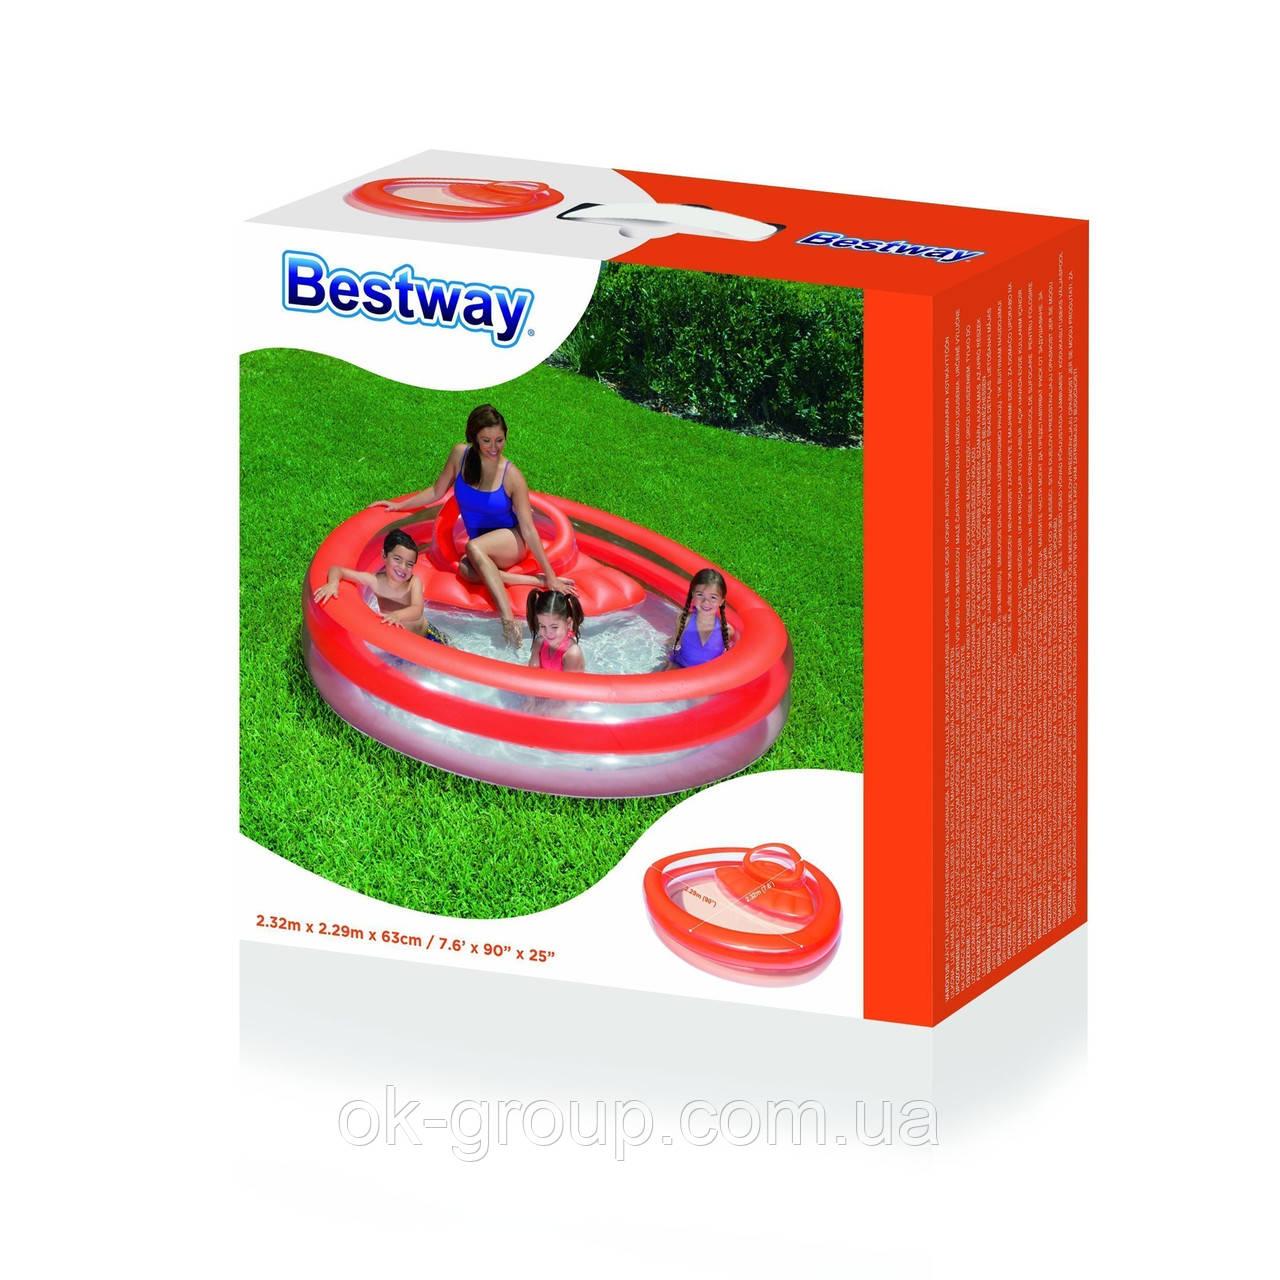 Bestway 54158 Бассейн надувной